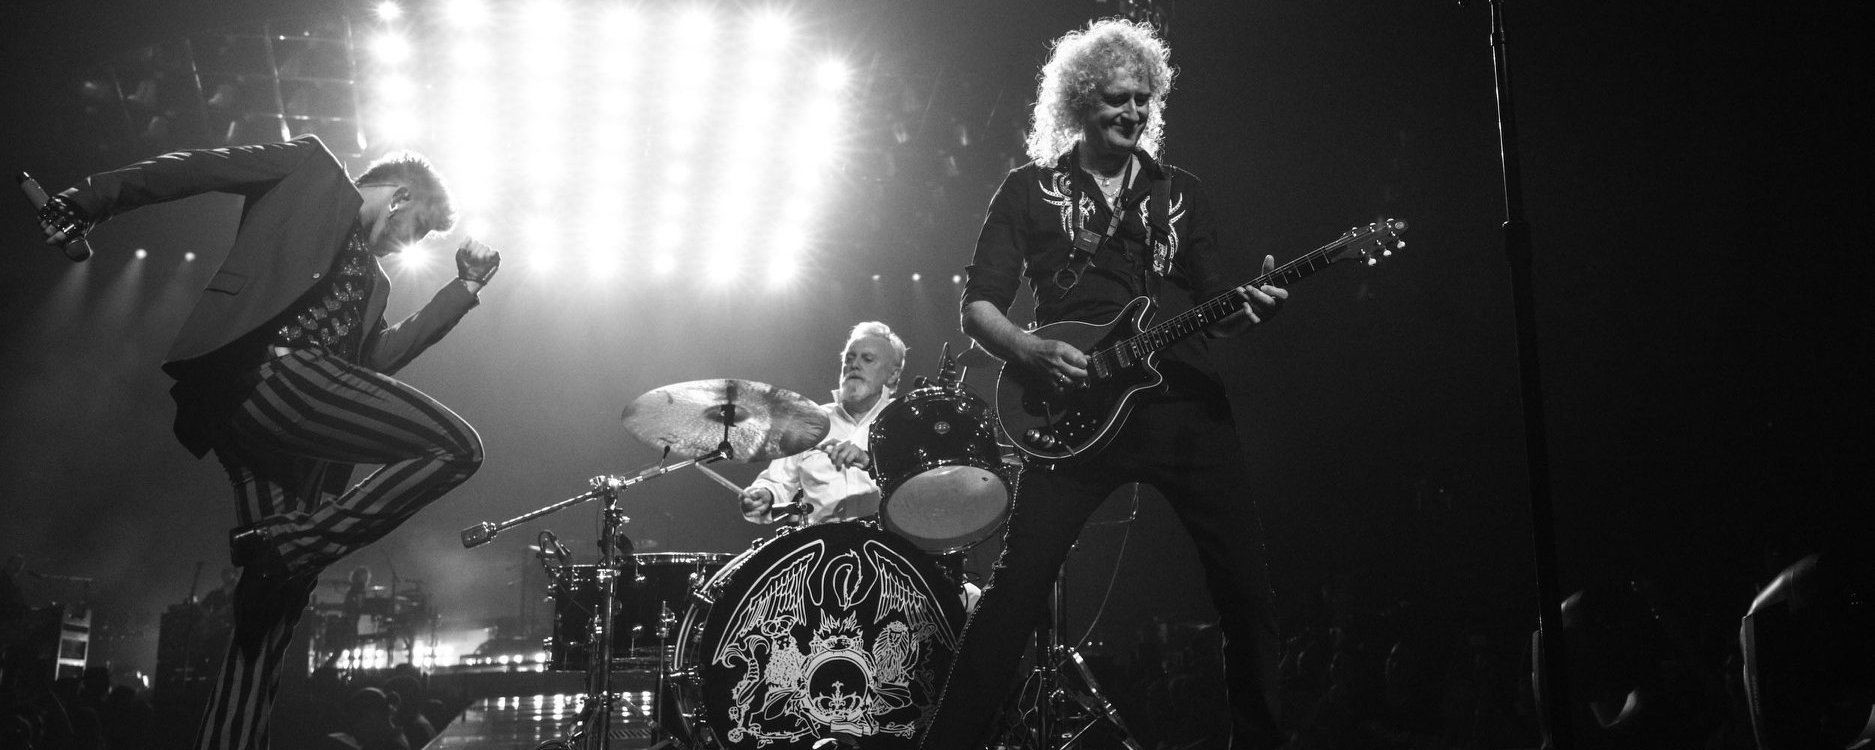 Queen + Adam Lambert. The Rhapsody Tour. Copenhagen, Denmark